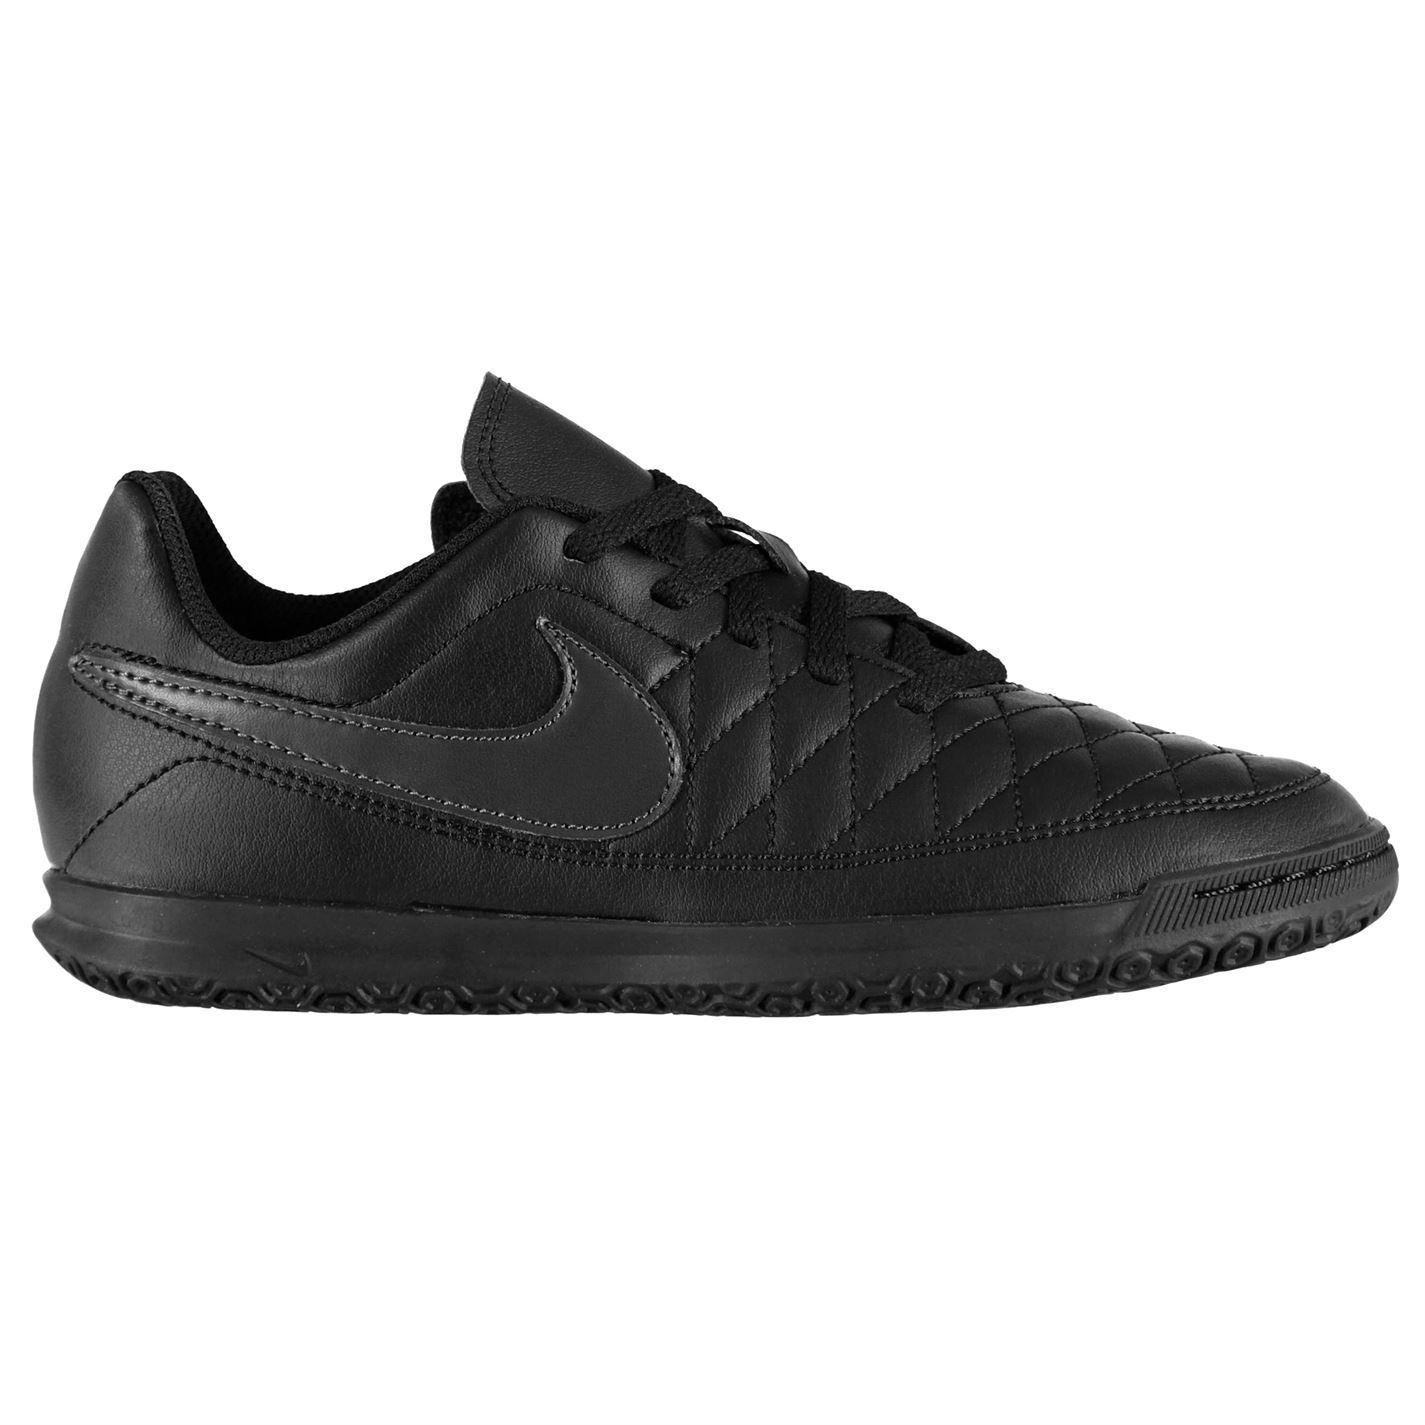 Majestry Details Court Turnschuhe zu Nike Fußballschuhe Kinder Innen Schuhe Fußball TlF1JK3uc